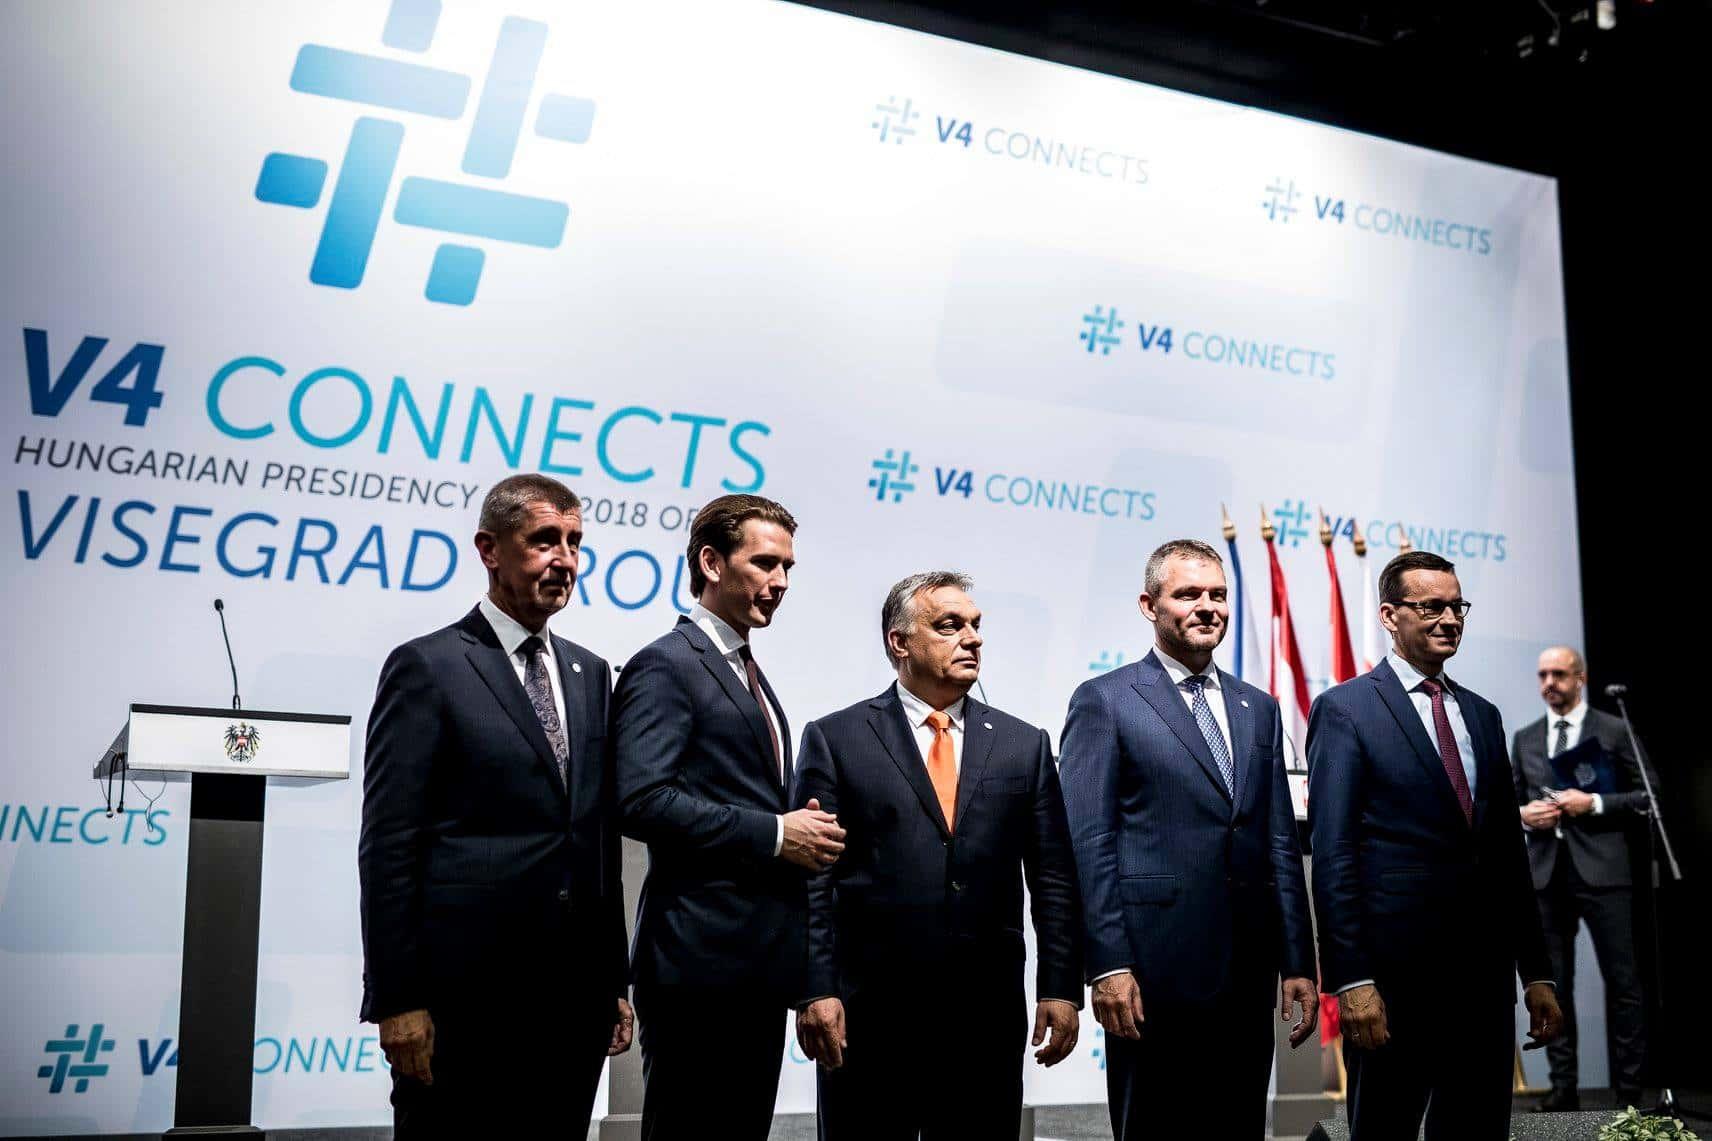 De gauche à droite : Andrej Babiš (CZ), Sebastian Kurz (AT), Viktor Orbán (HU), Peter Pellegrini (SK), Mateusz Morawiecki (PL). SOurce : page Facebook de Viktor Orbán.